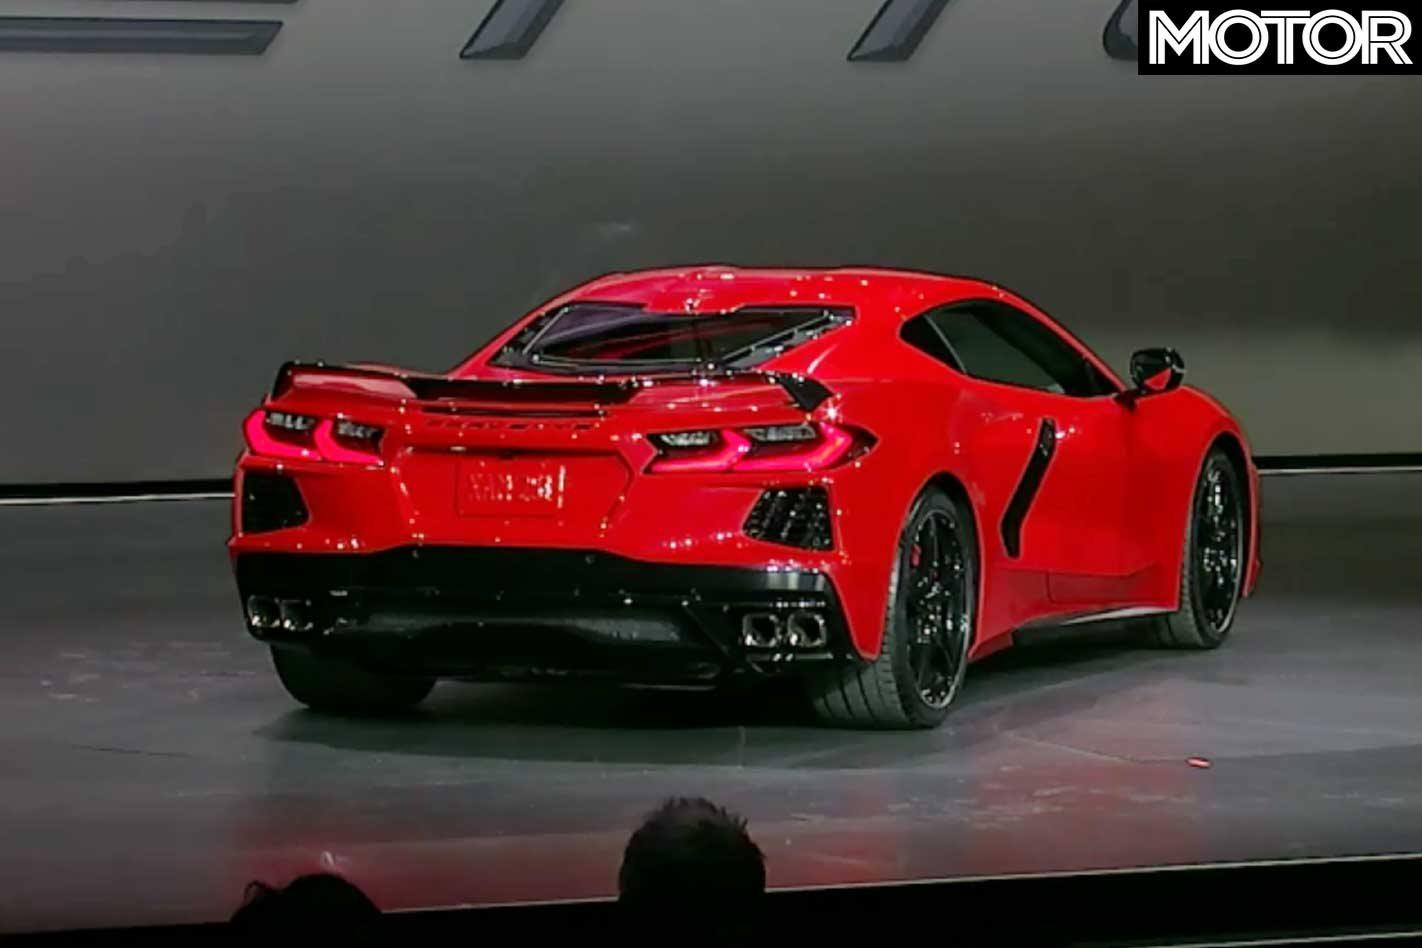 2020 Chevrolet C8 Corvette Stingray revealed, coming to